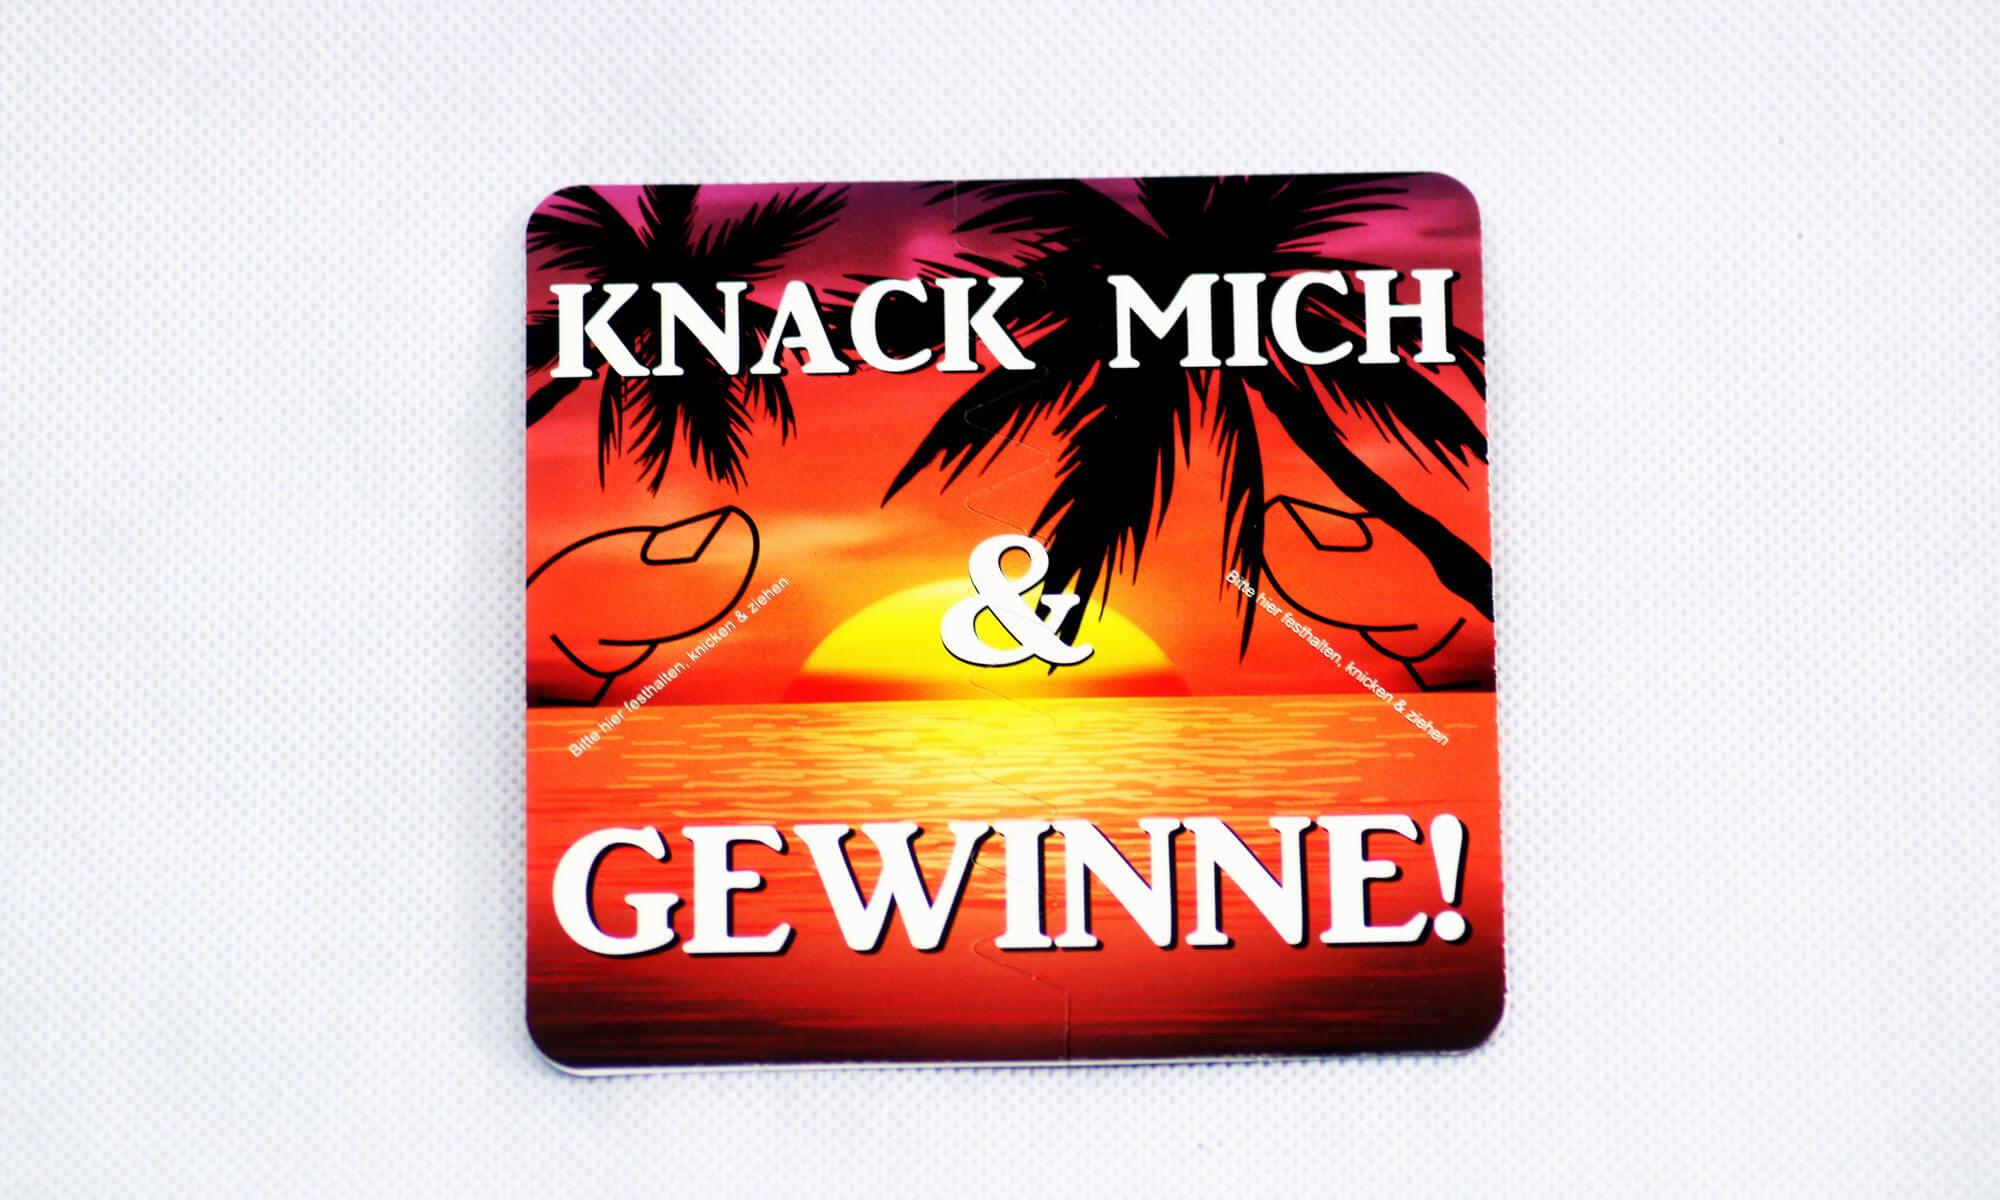 https://knacklos24.de/wp-content/uploads/2017/01/knacklose-karibik-geschlossen.jpg